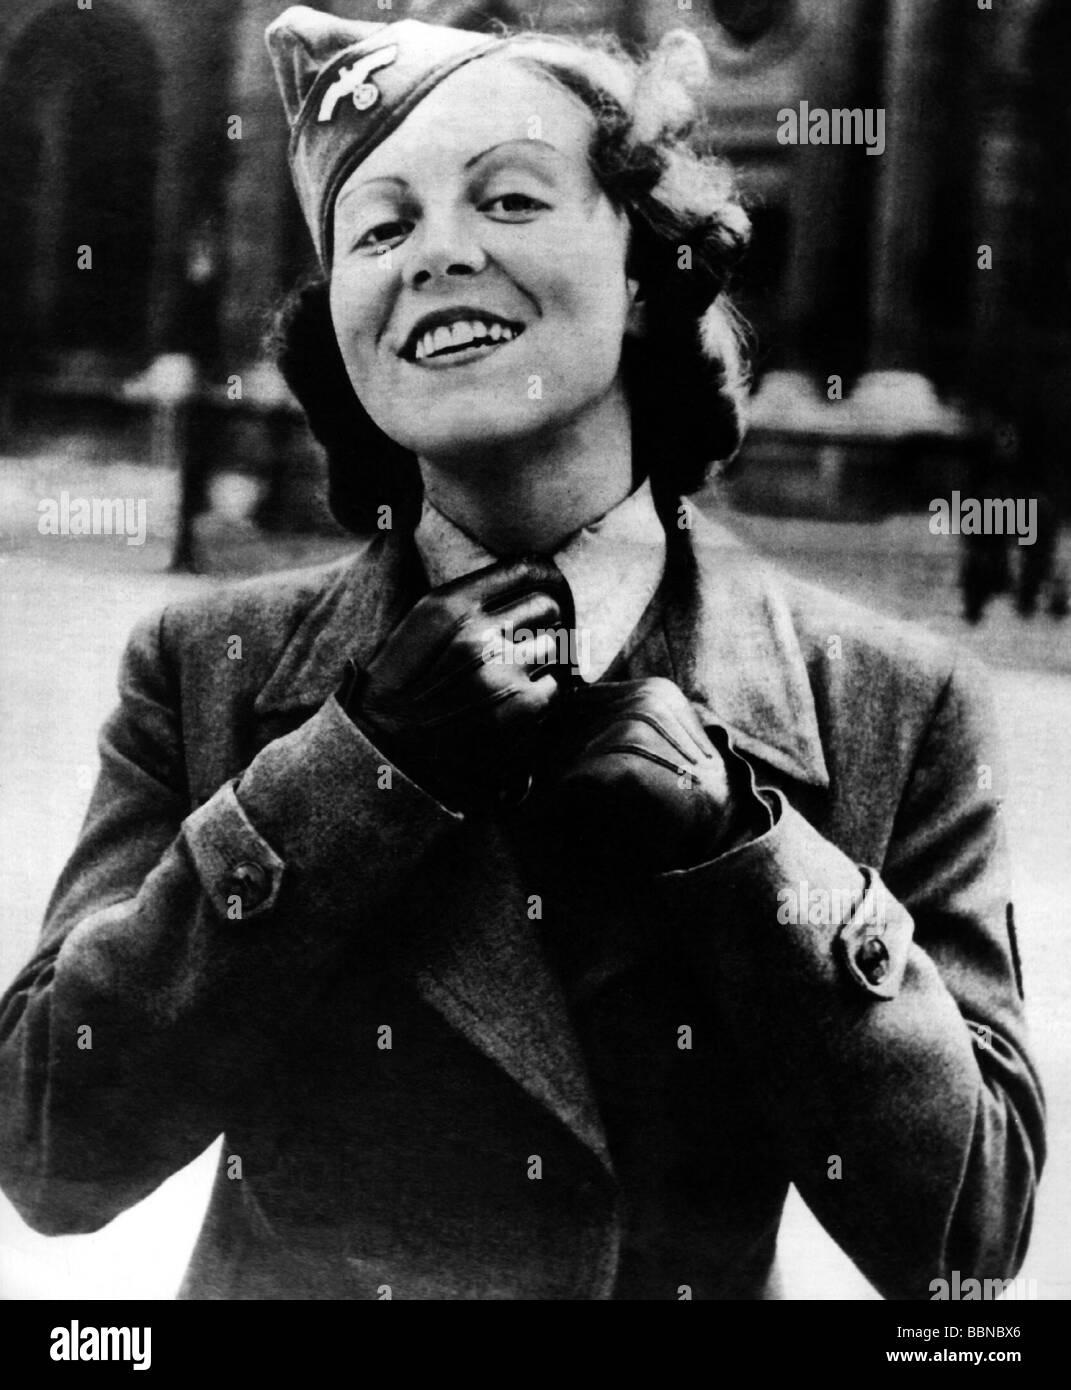 Events Second World War Wwii Germany Women In War